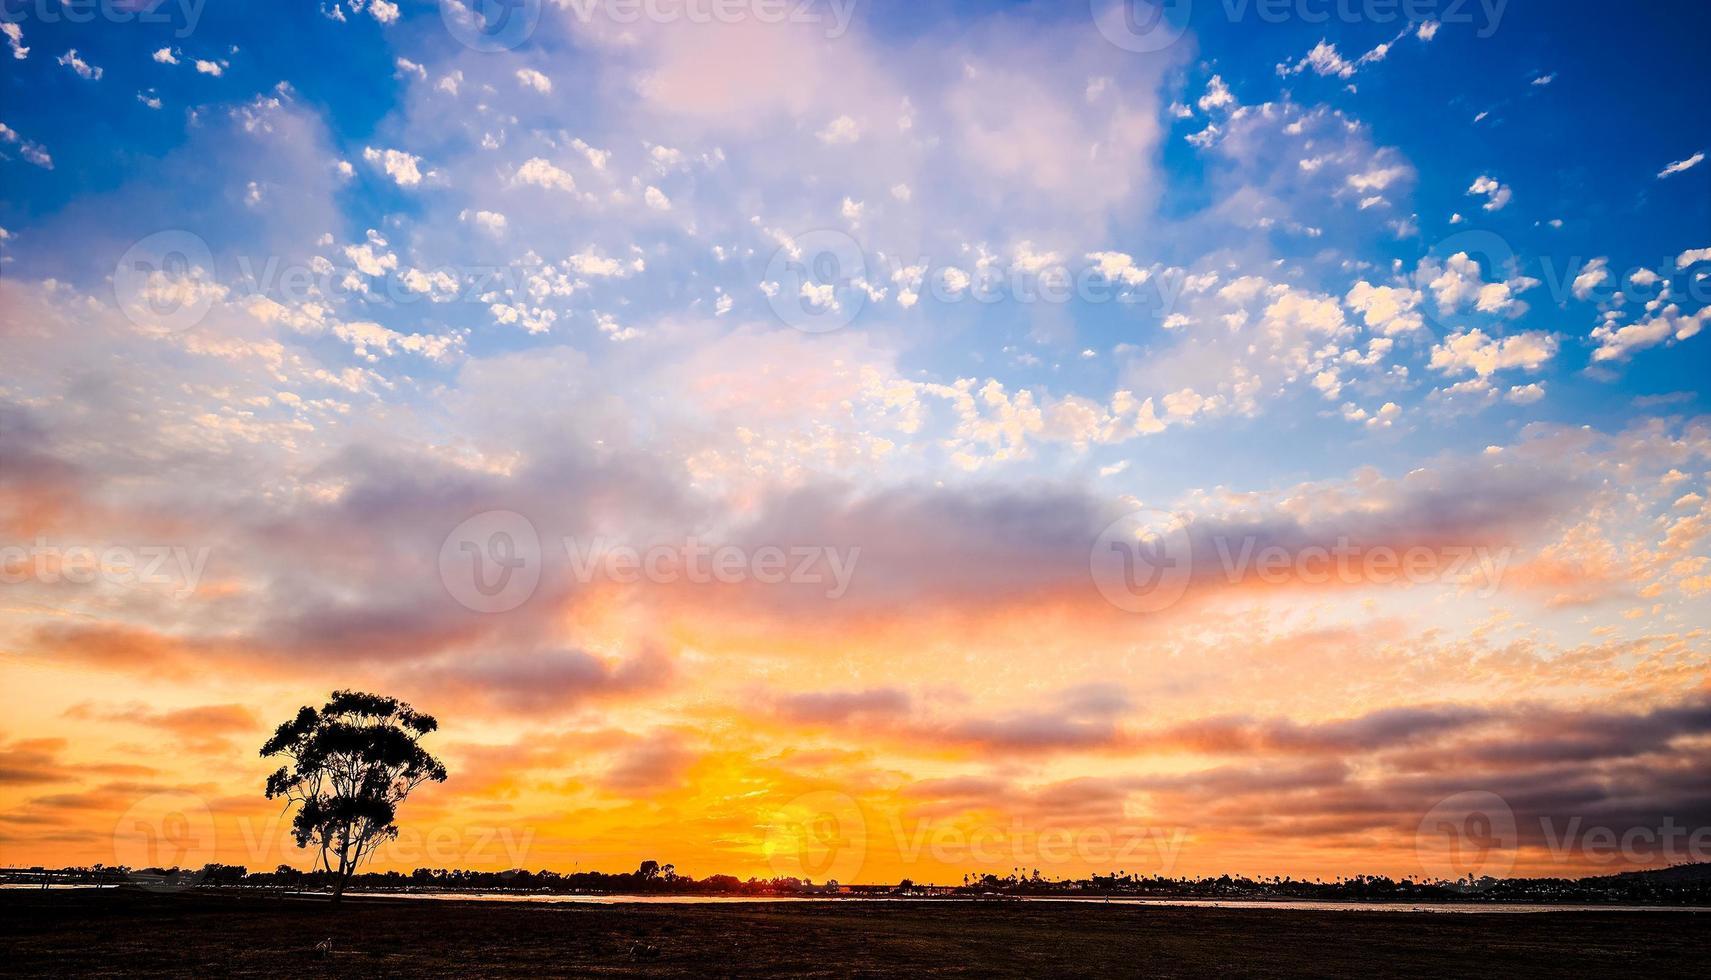 Mission Bay zonsondergang. San Diego, Californië, VS. foto